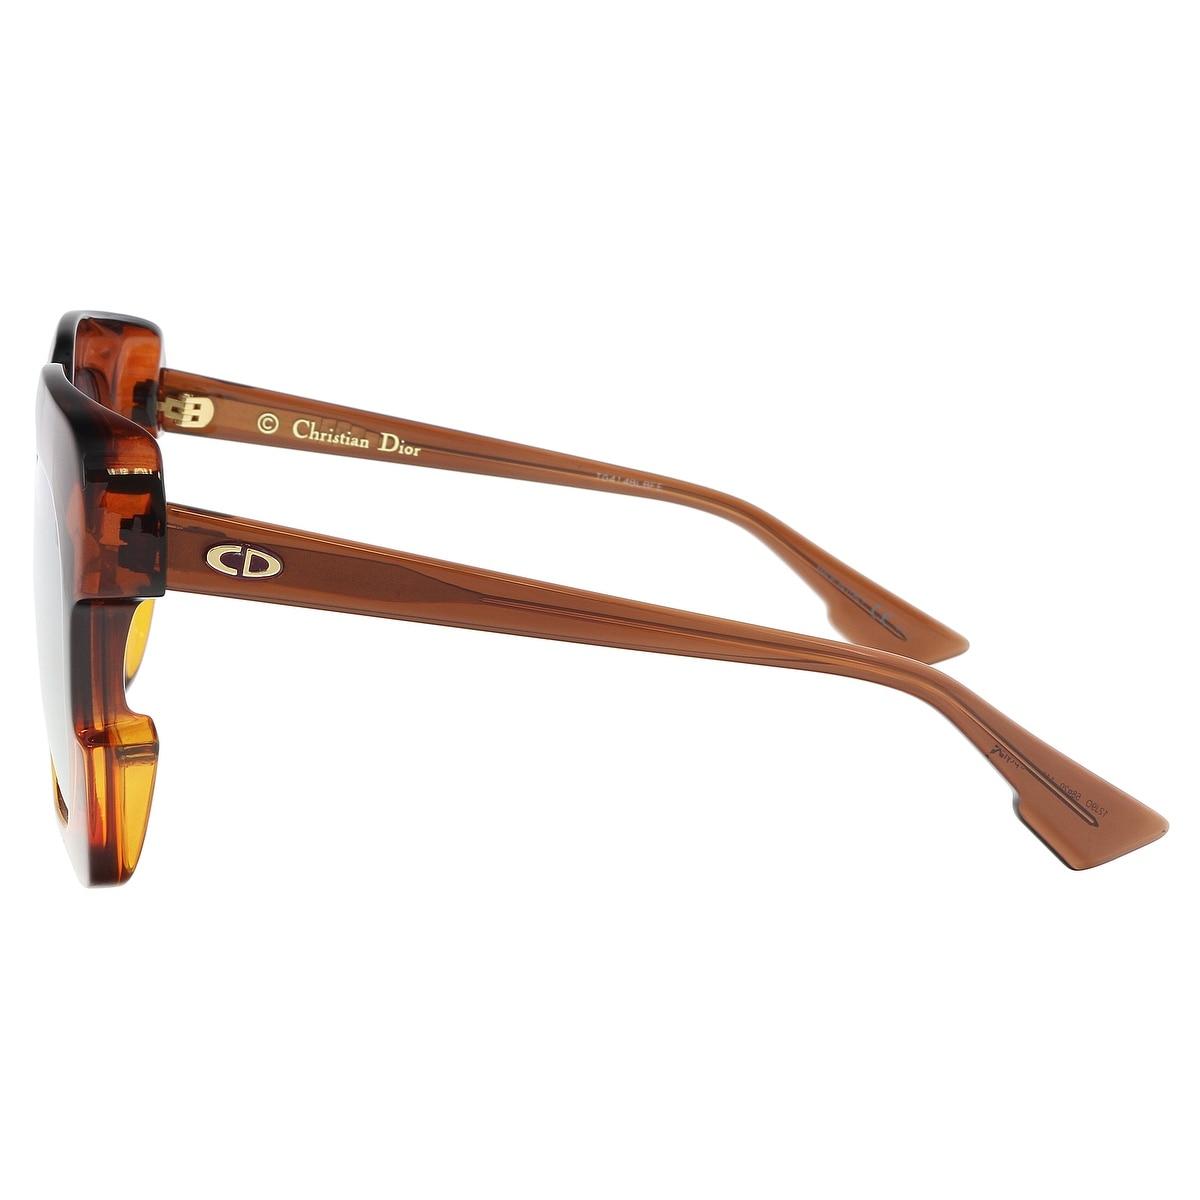 5b710d0981 Shop Christian Dior DIORGAIA 012J Brown Orange Square Sunglasses -  58-20-140 - Free Shipping Today - Overstock - 21158412